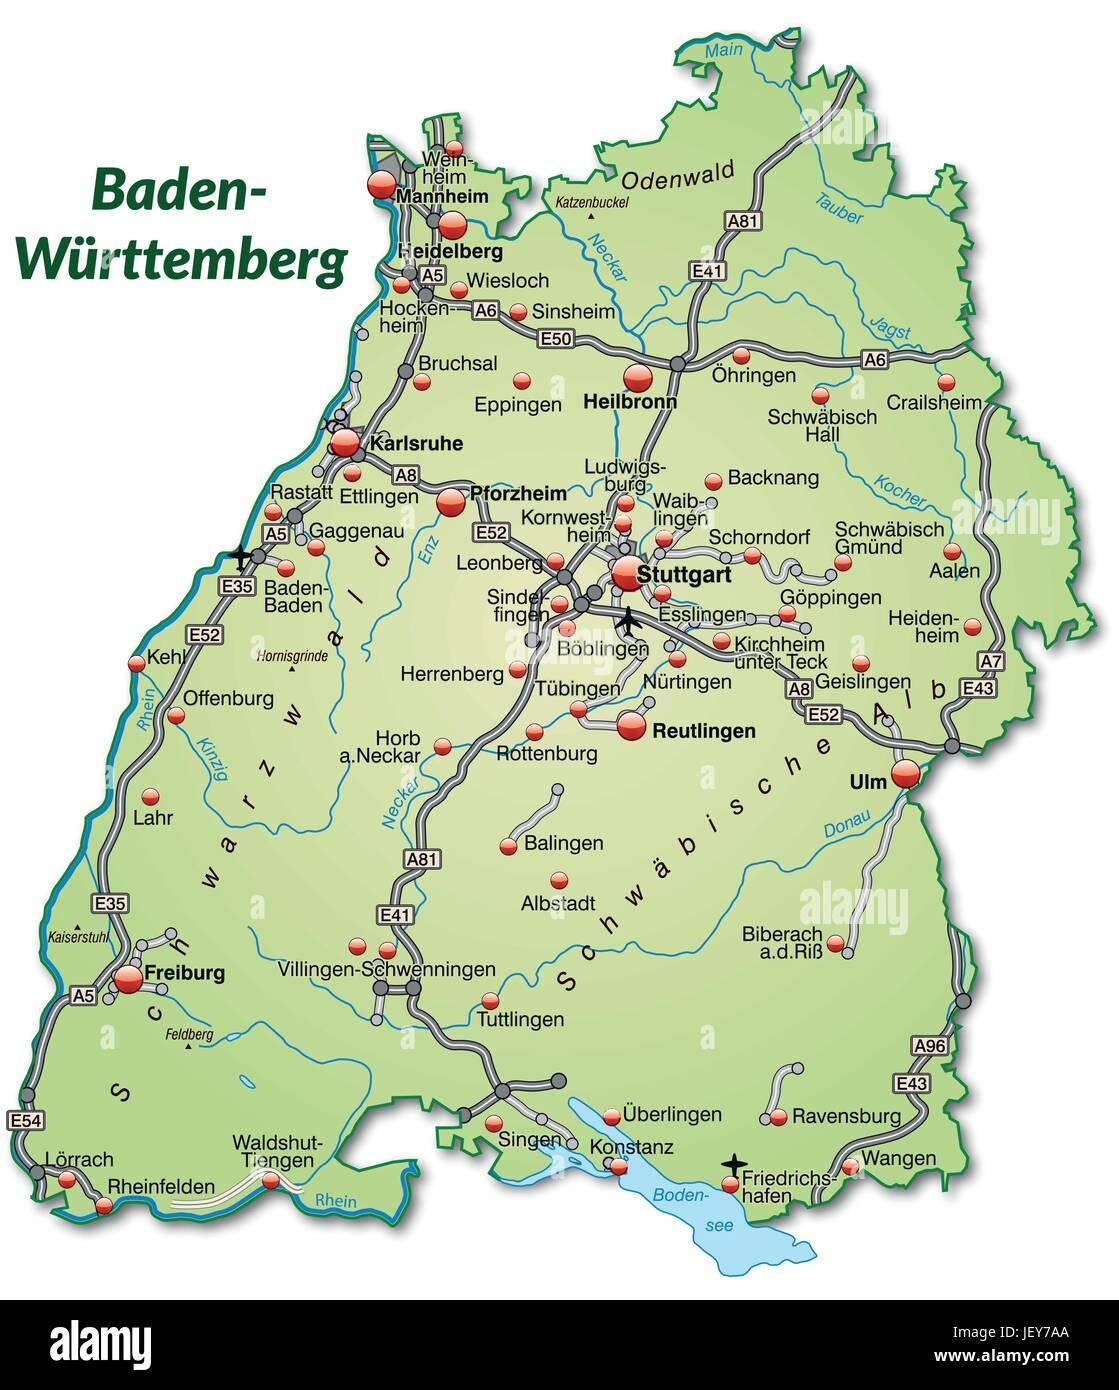 Map Of Badenwurttemberg Stock Photos Map Of Badenwurttemberg